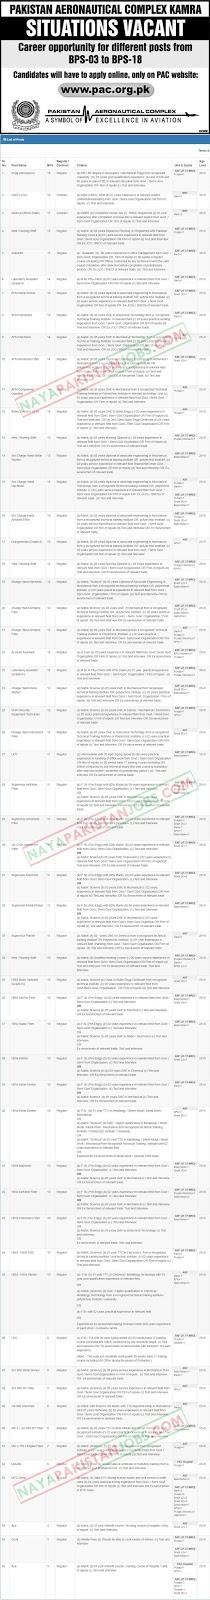 PAC KAMRA Jobs, PAC Kamra latest jobs announced, apply online for pac kamra jobs , pac kamra jobs pac.org.pk